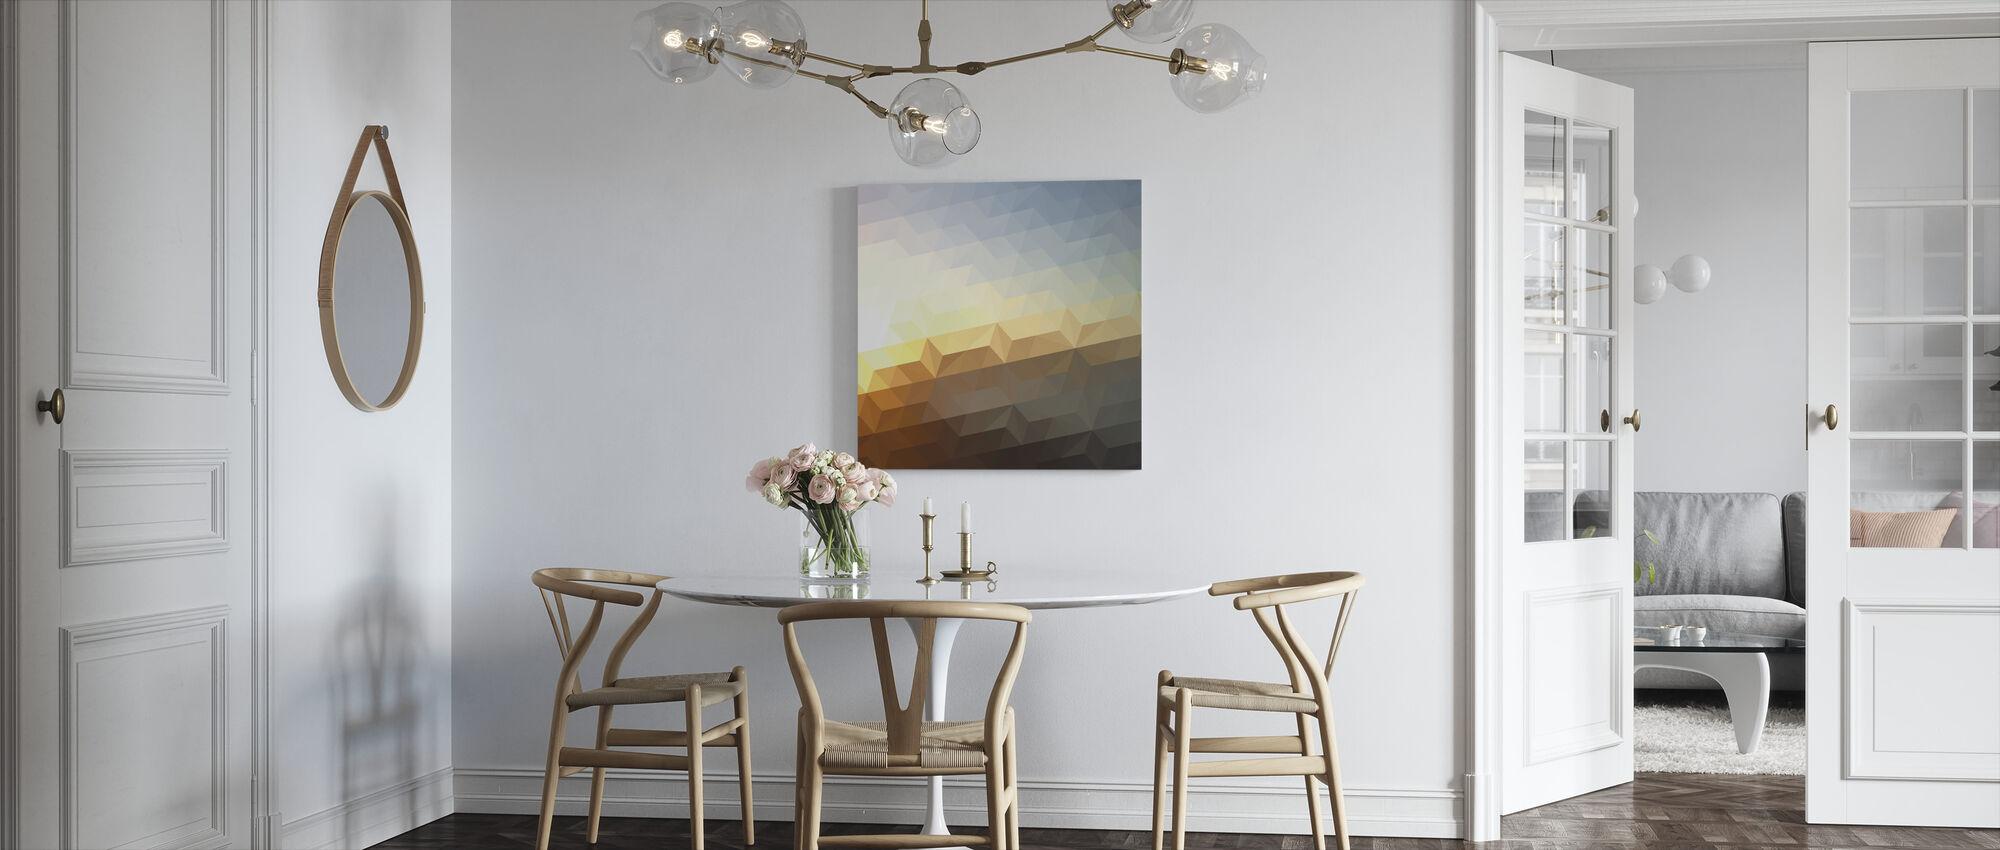 Abstrakti auringonlasku - Canvastaulu - Keittiö